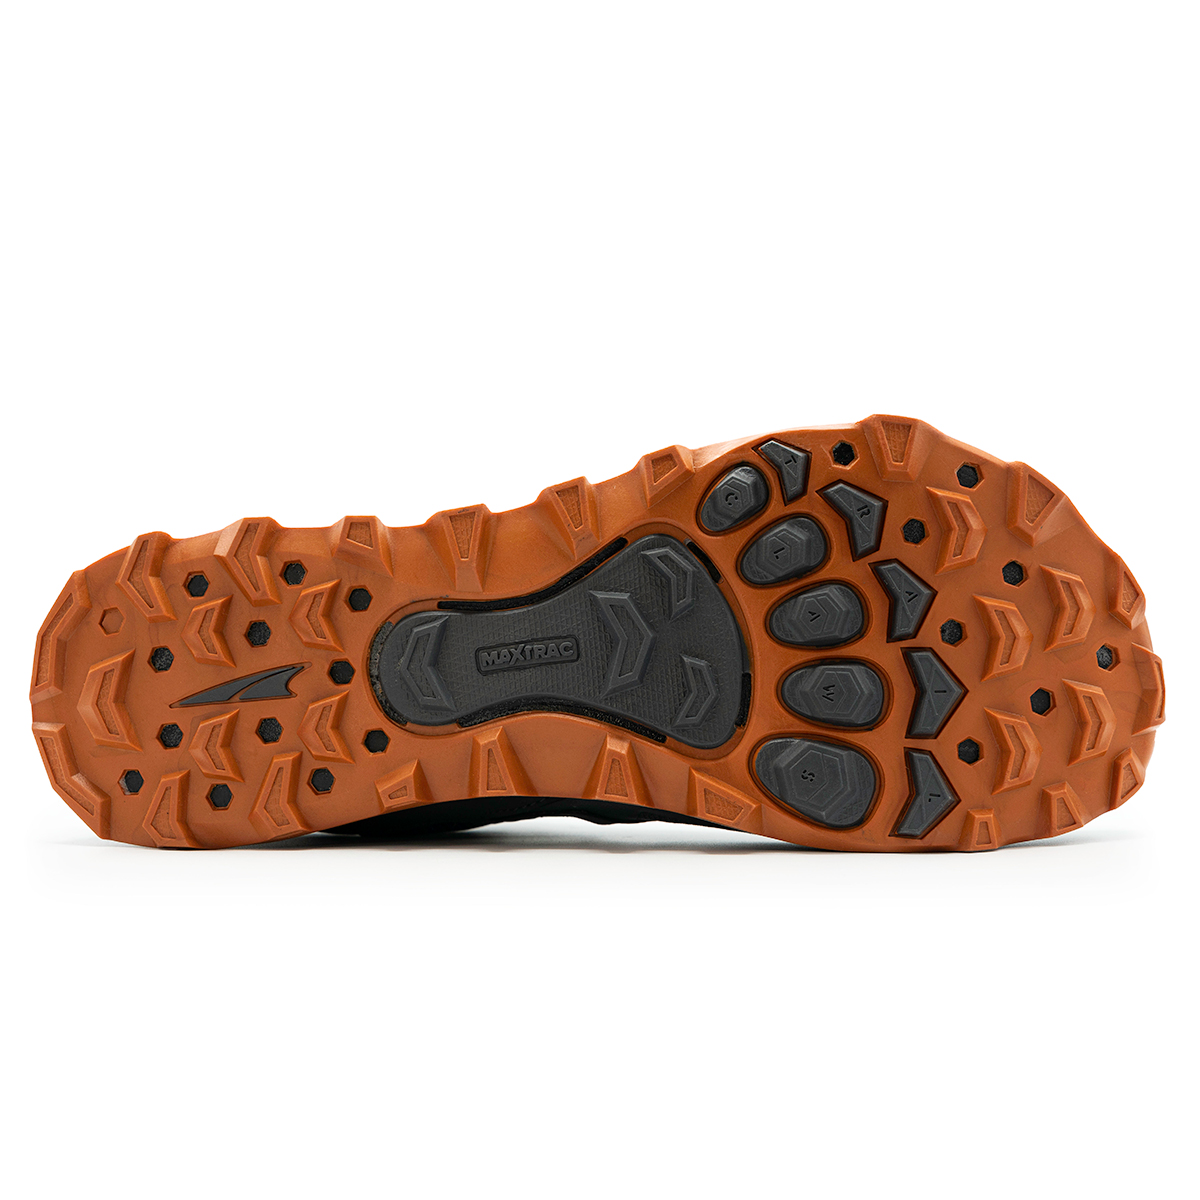 Men's Altra Lone Peak 4.5 Low Trail Running Shoe - Color: Gray/Orange - Size: 10 - Width: Regular, Gray/Orange, large, image 4